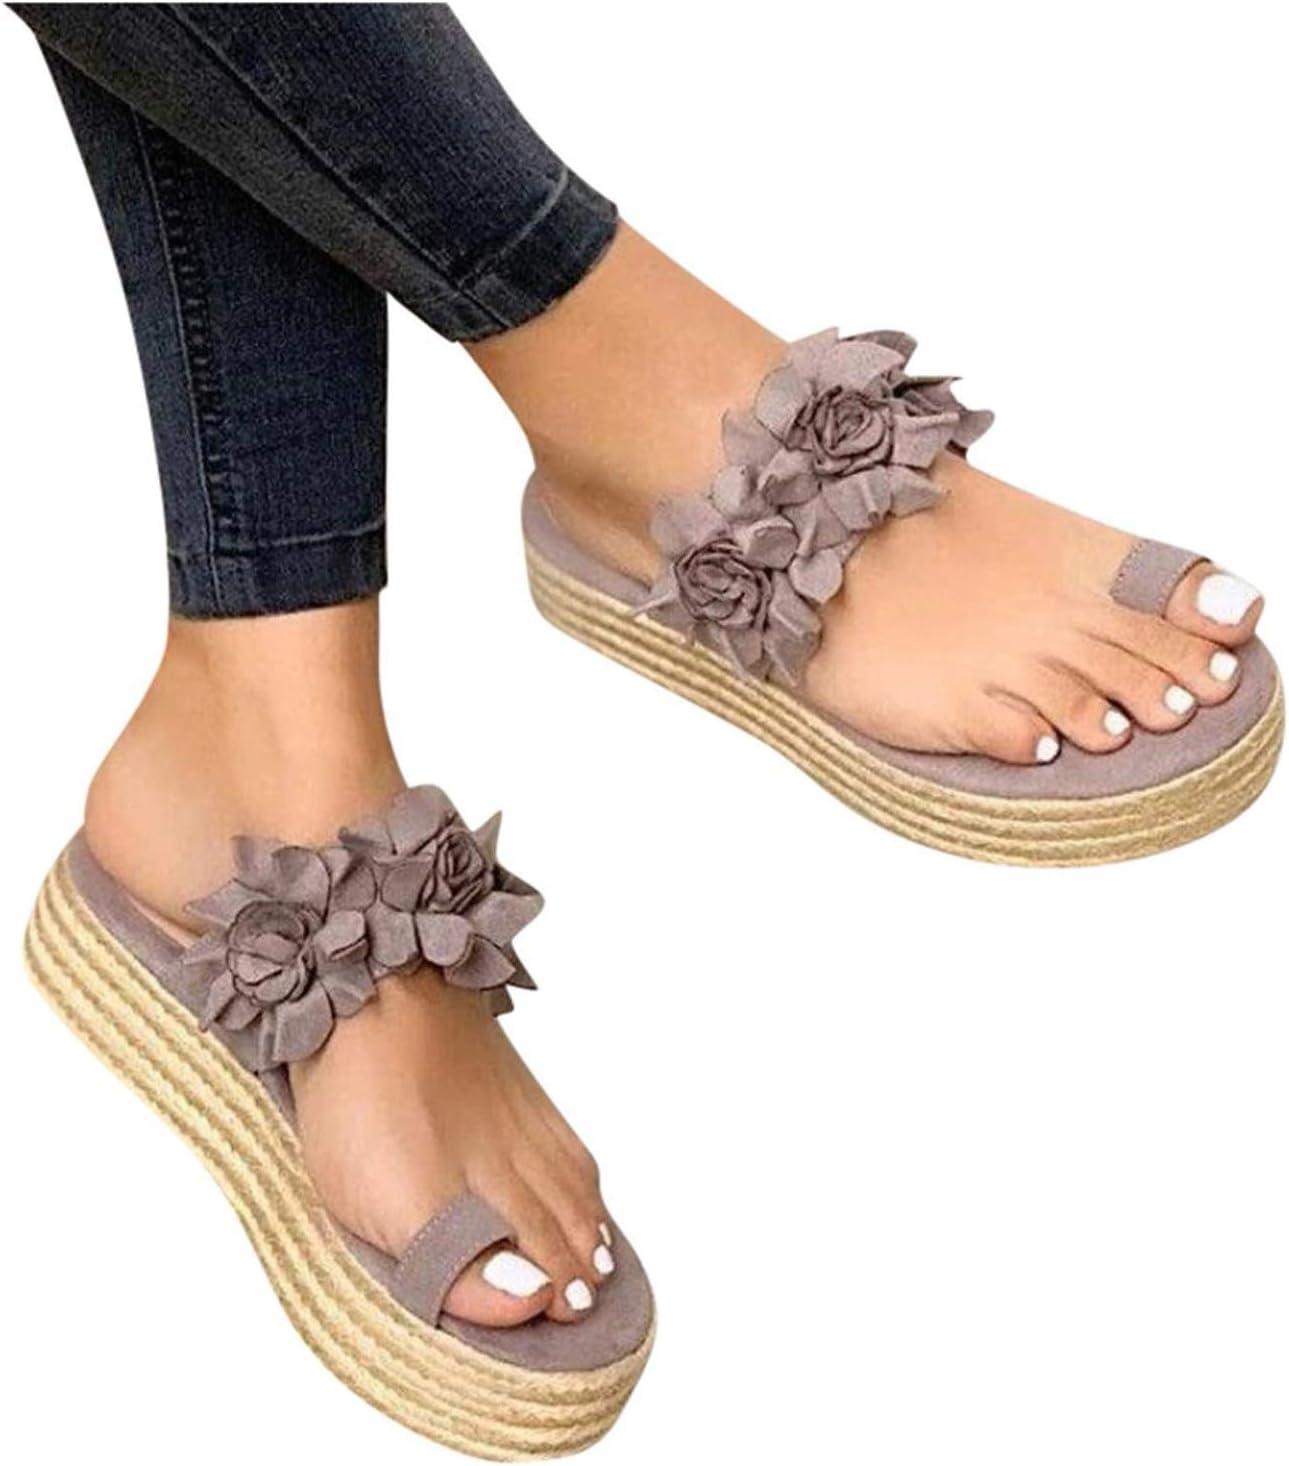 Fukasse Women's Slides Flower Sandals for Women Casual Summer Toe Ring Espadrille Platform Wedge Dress Slip On Sandals Boho Dress Slipper for Vacation Wedding Party